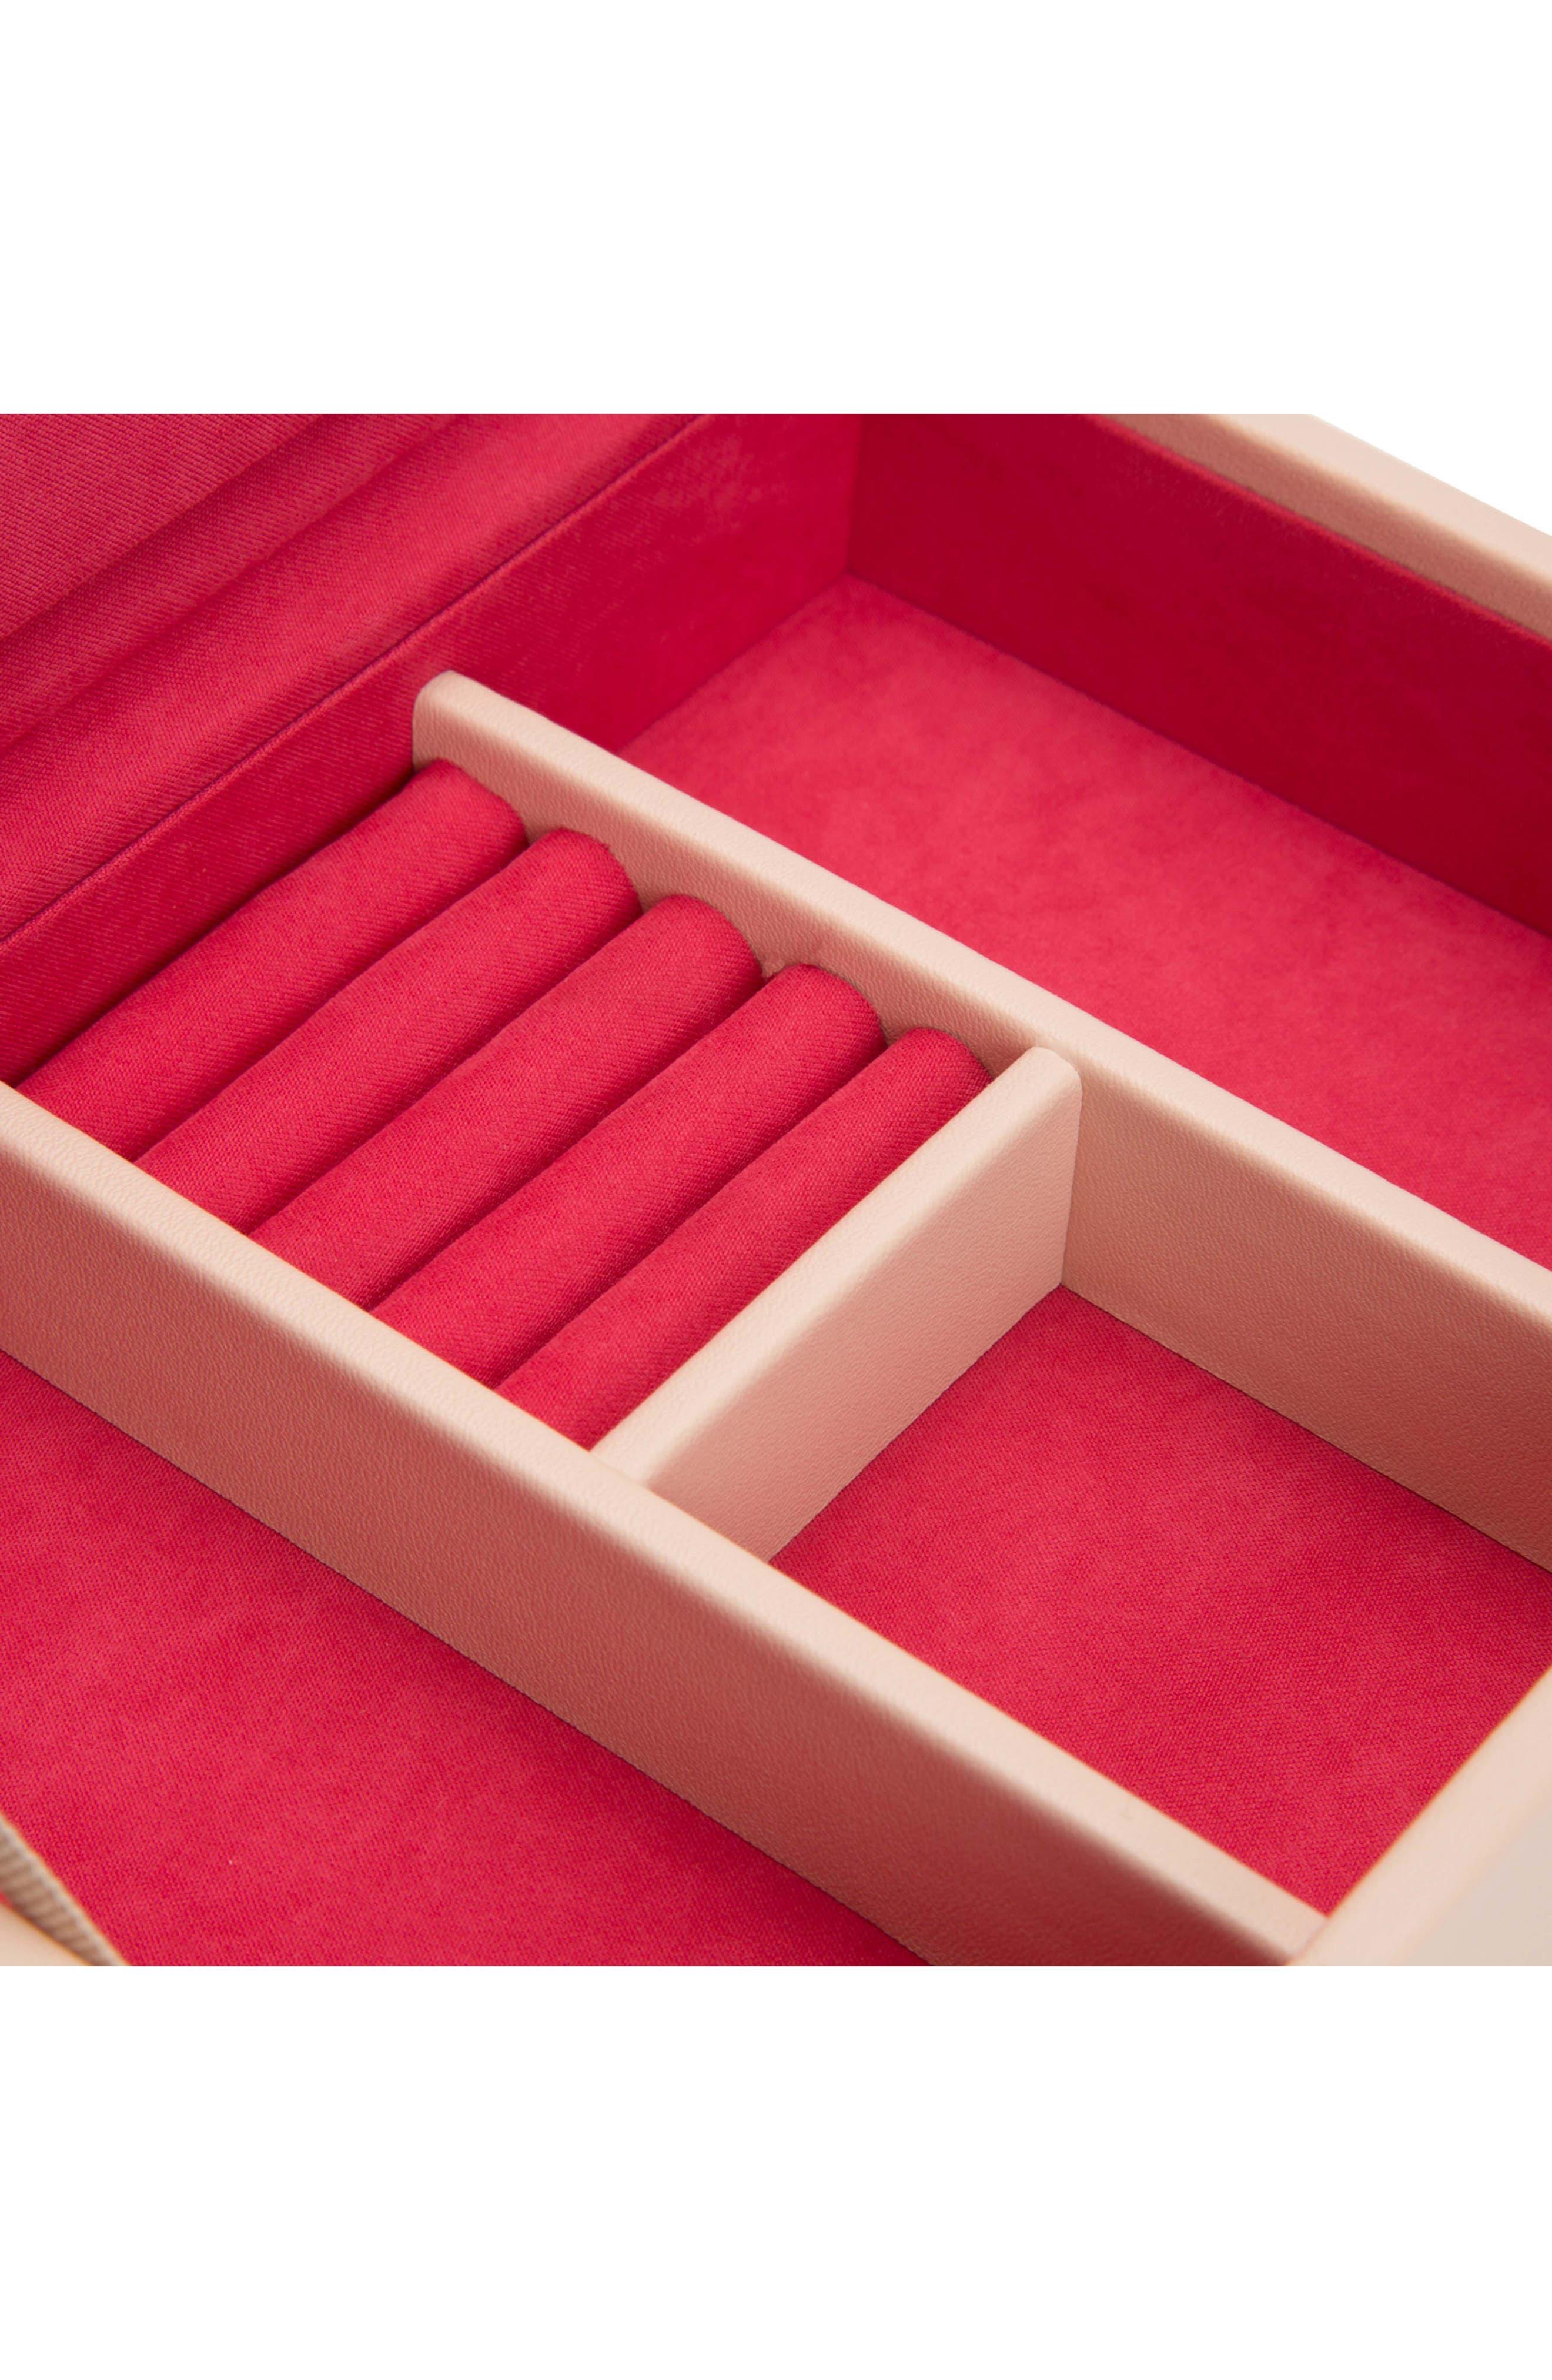 Mini Stackable Tray Set,                             Alternate thumbnail 4, color,                             651